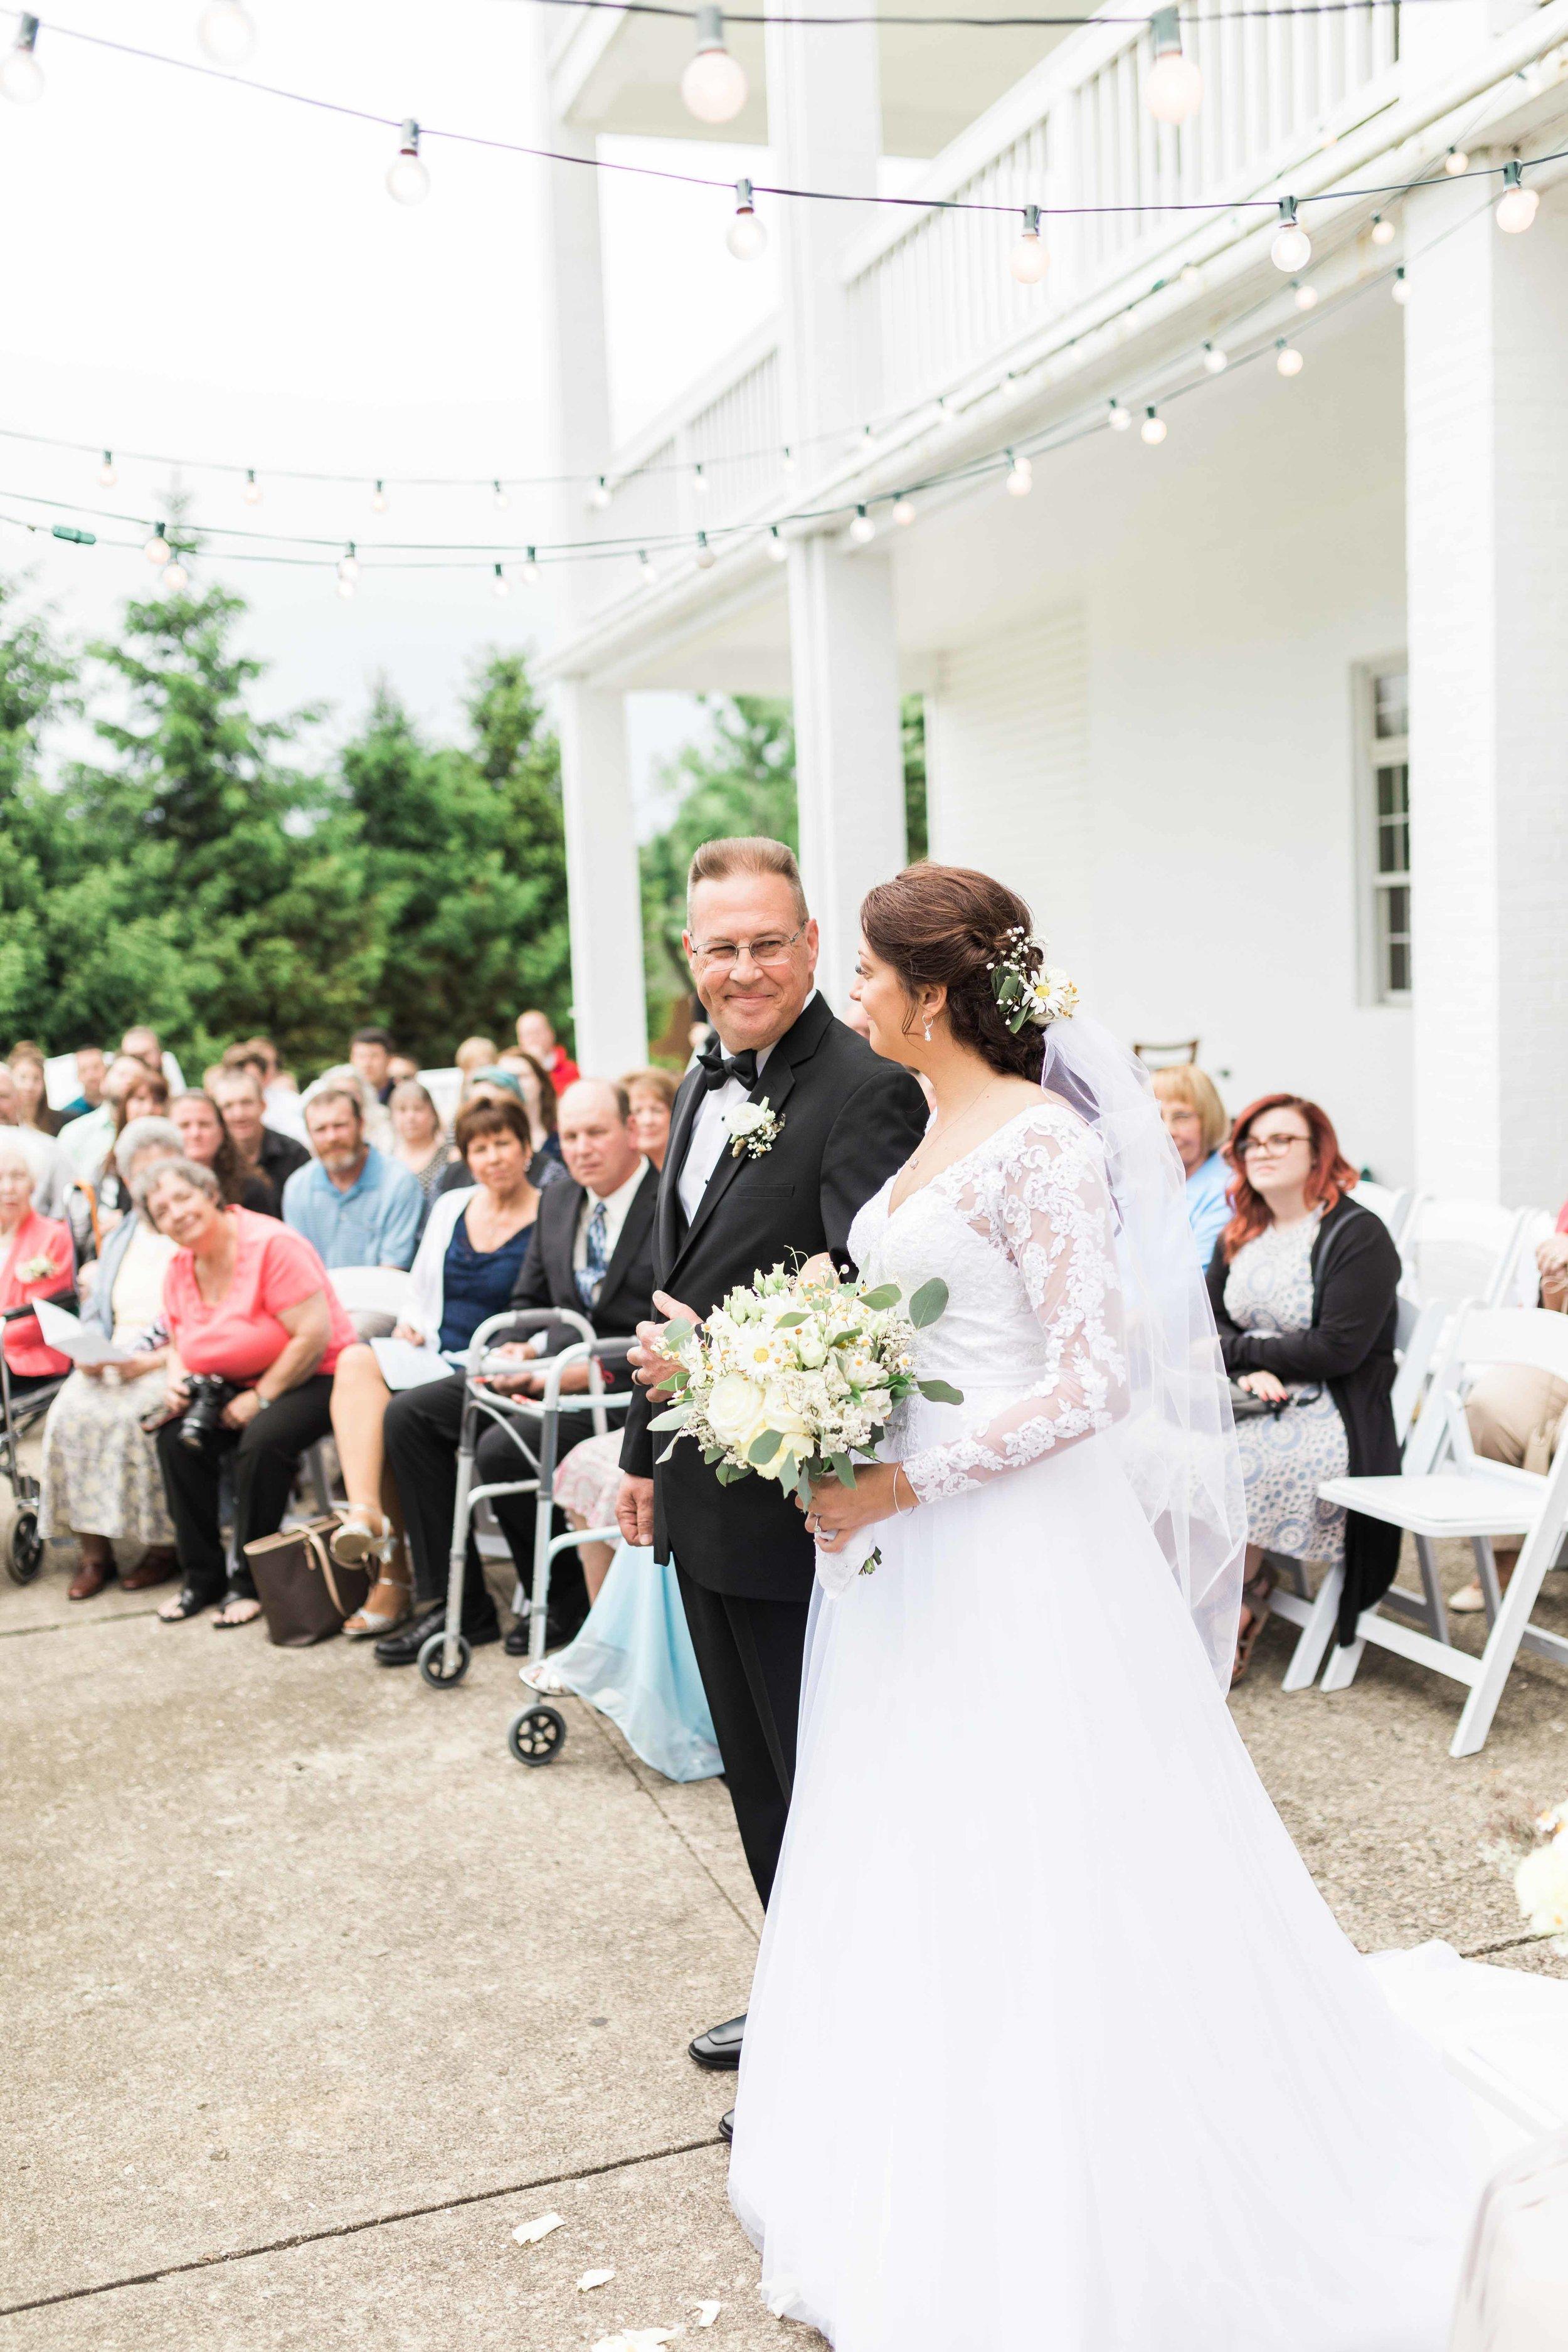 pebble creek golf course wedding ceremony-3.jpg